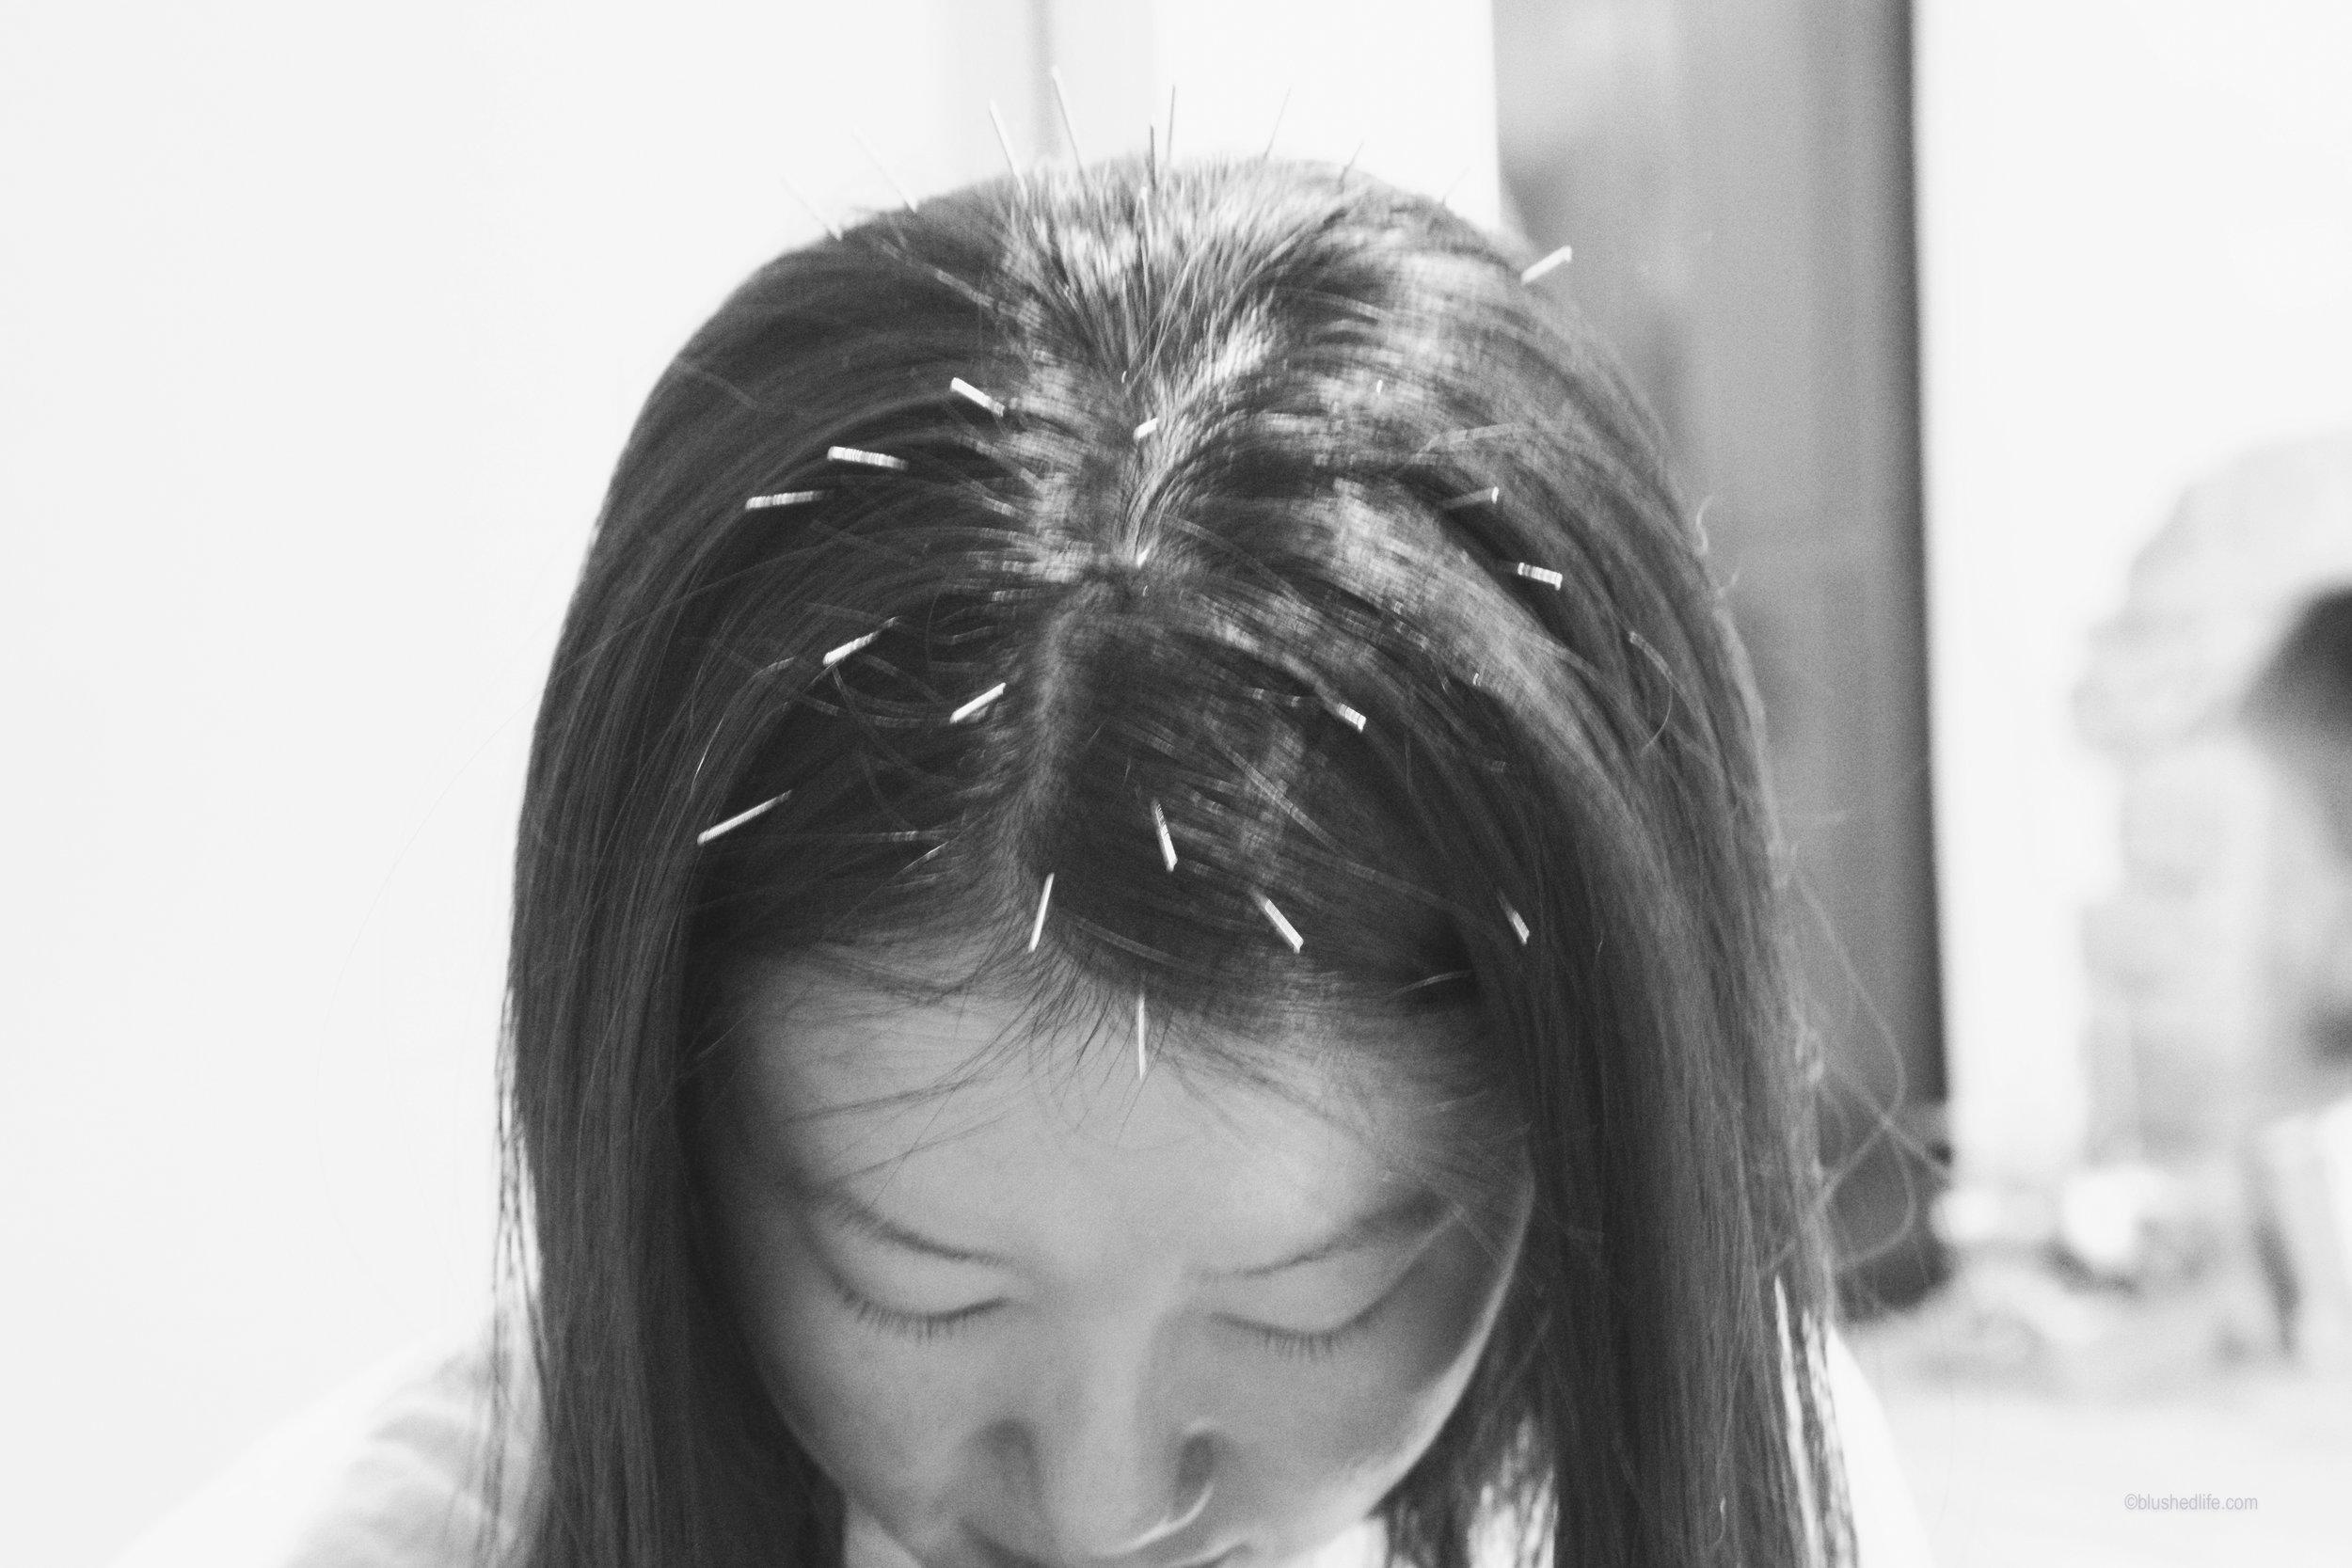 facial acupuncture acne pores_DSC07479-2.jpg